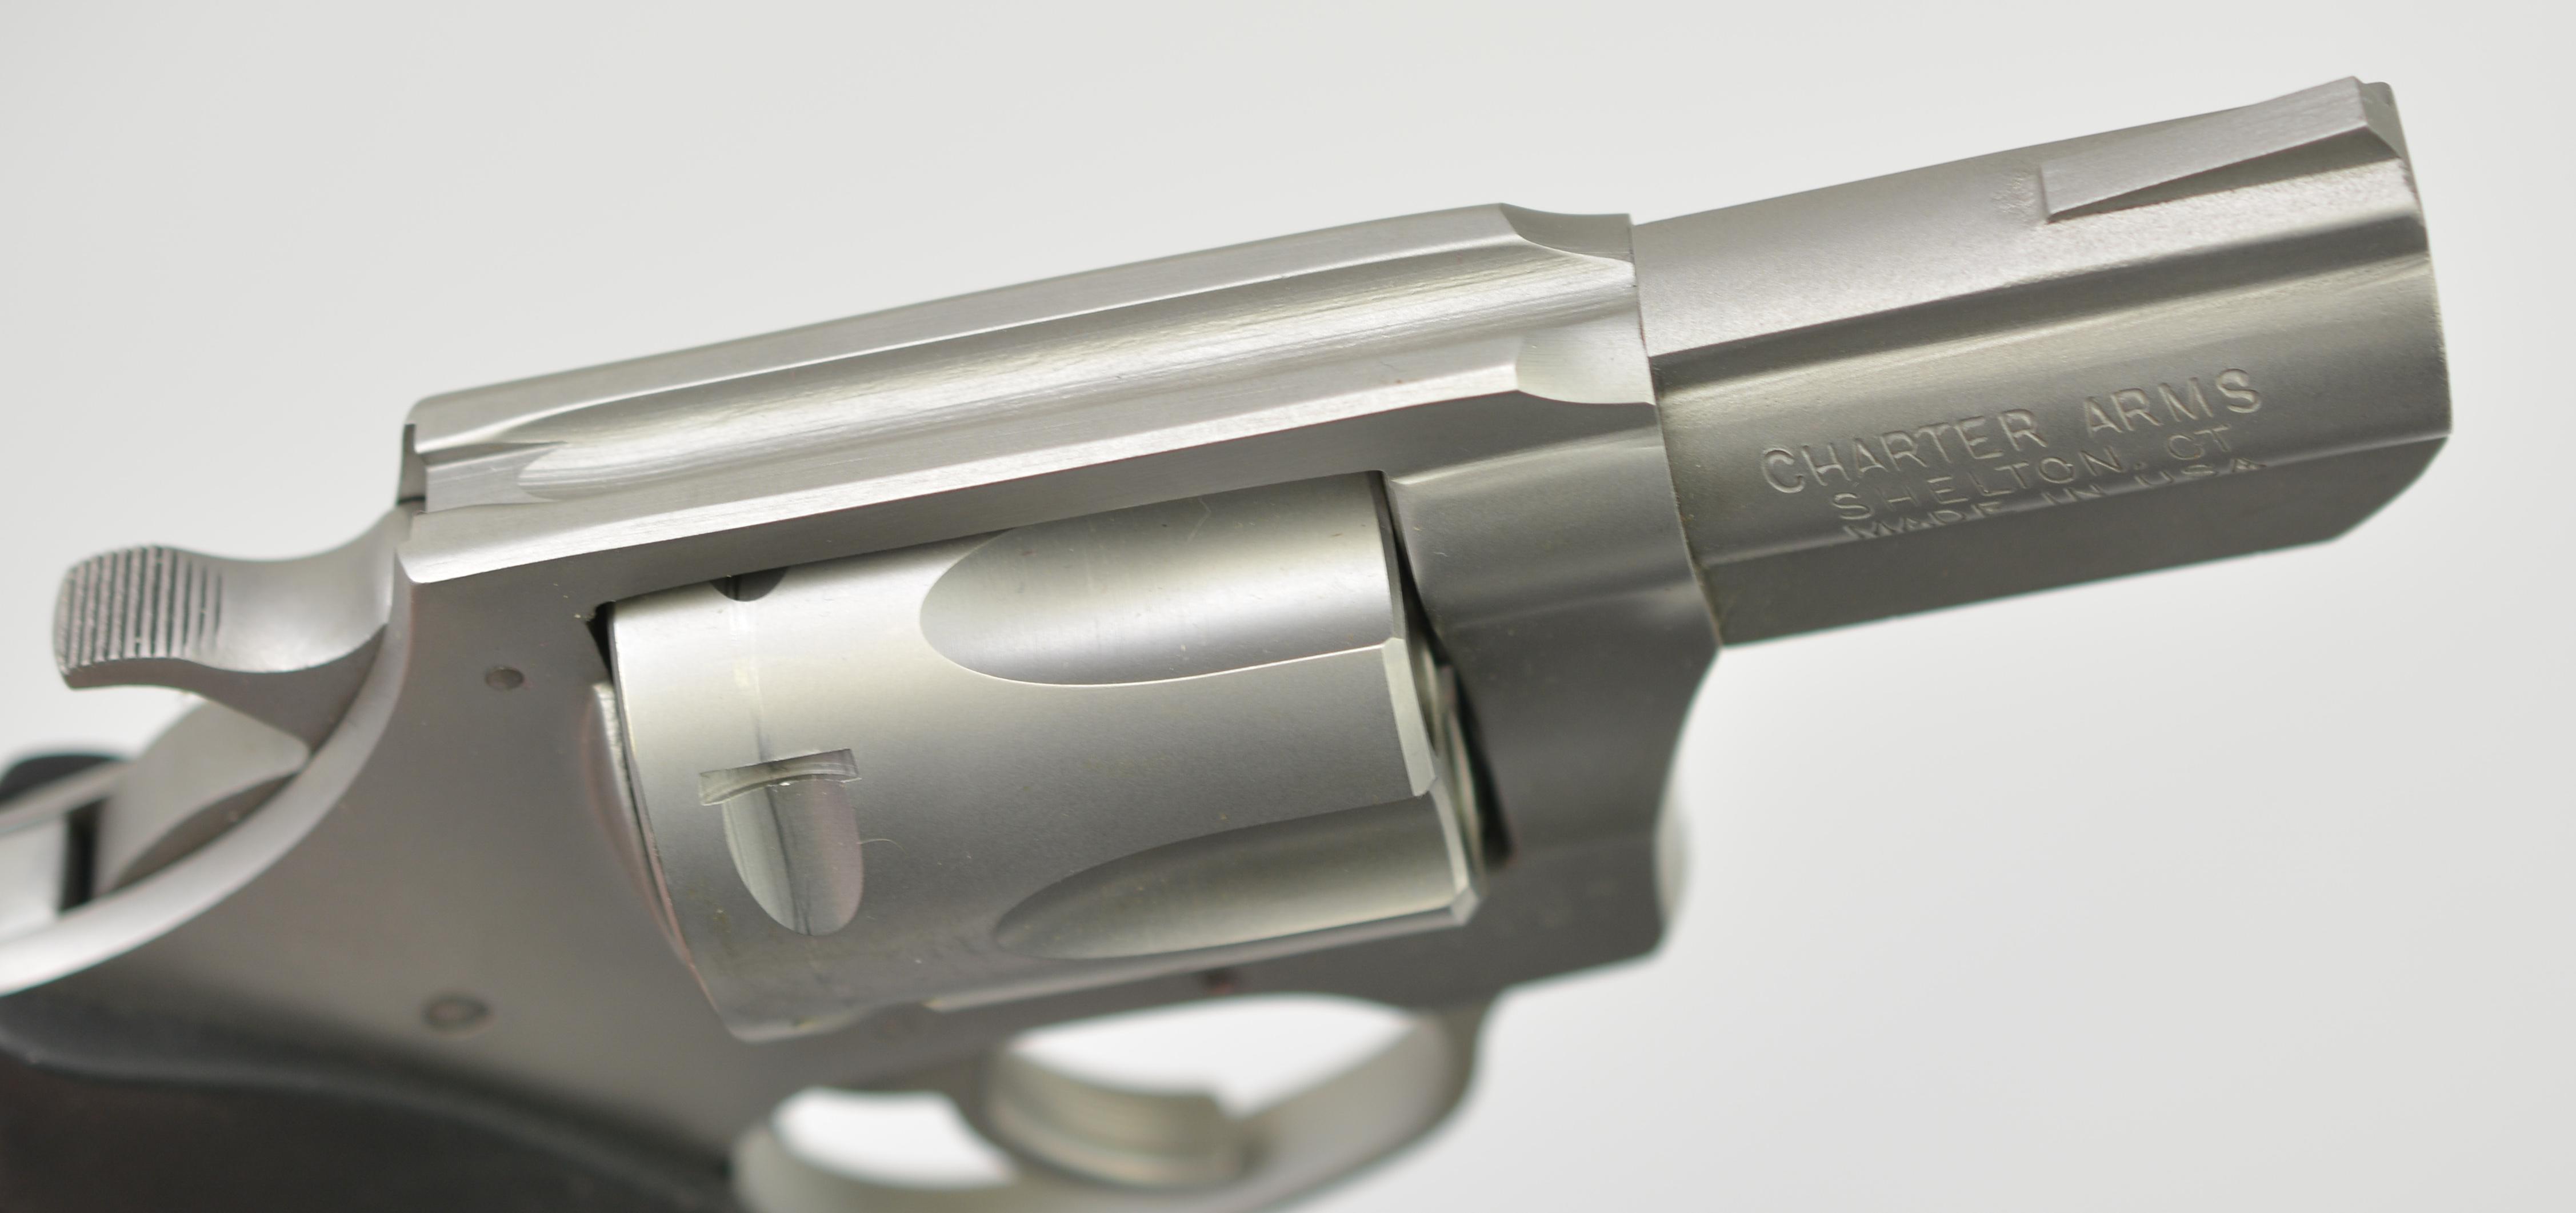 Charter Arms Pitbull 9mm Revolver